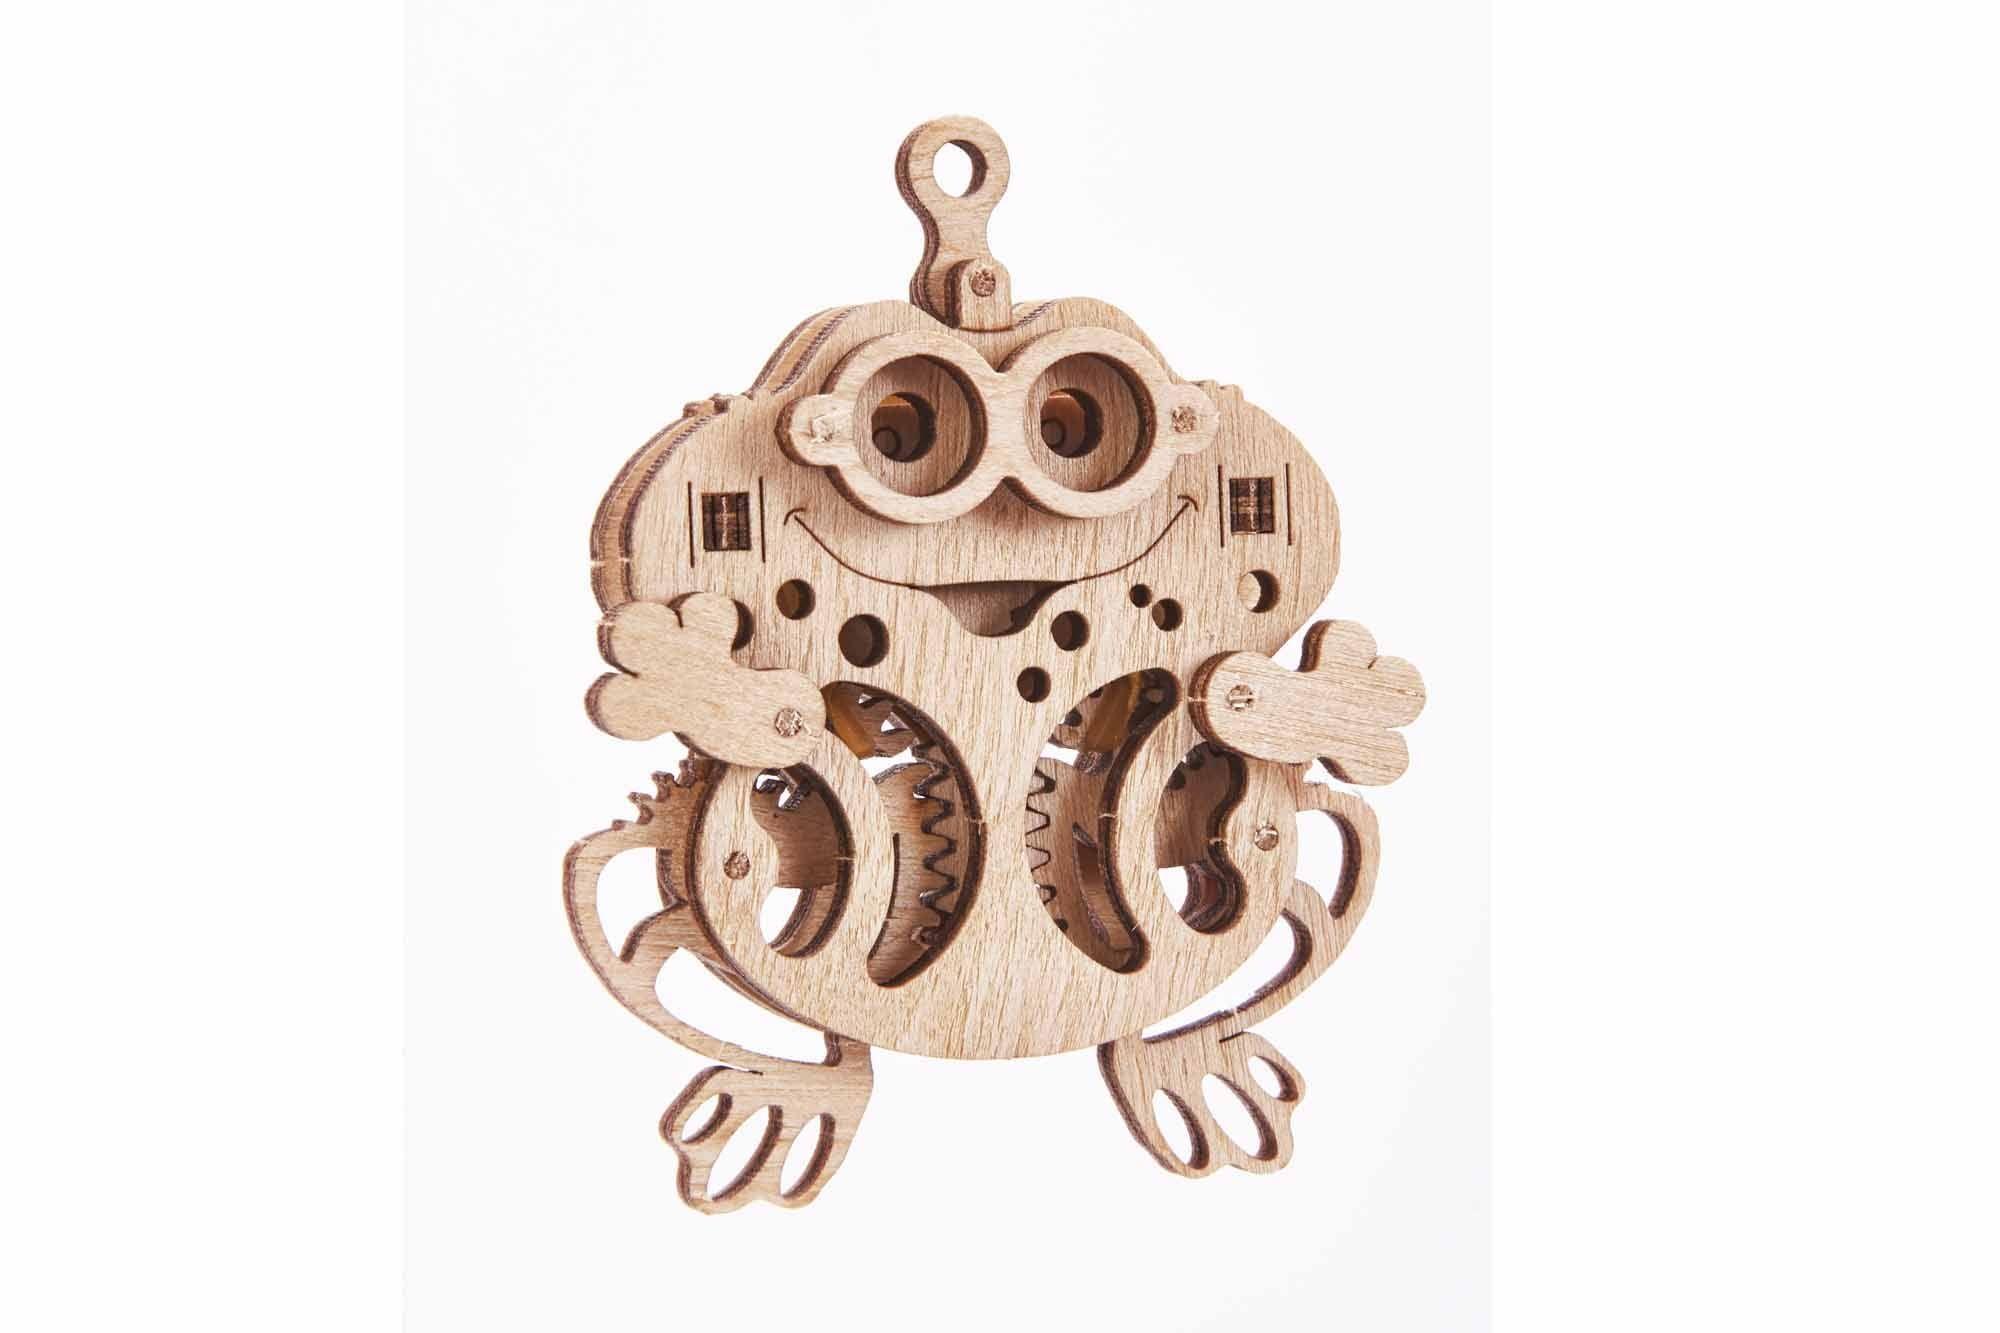 Wood Trick Frog